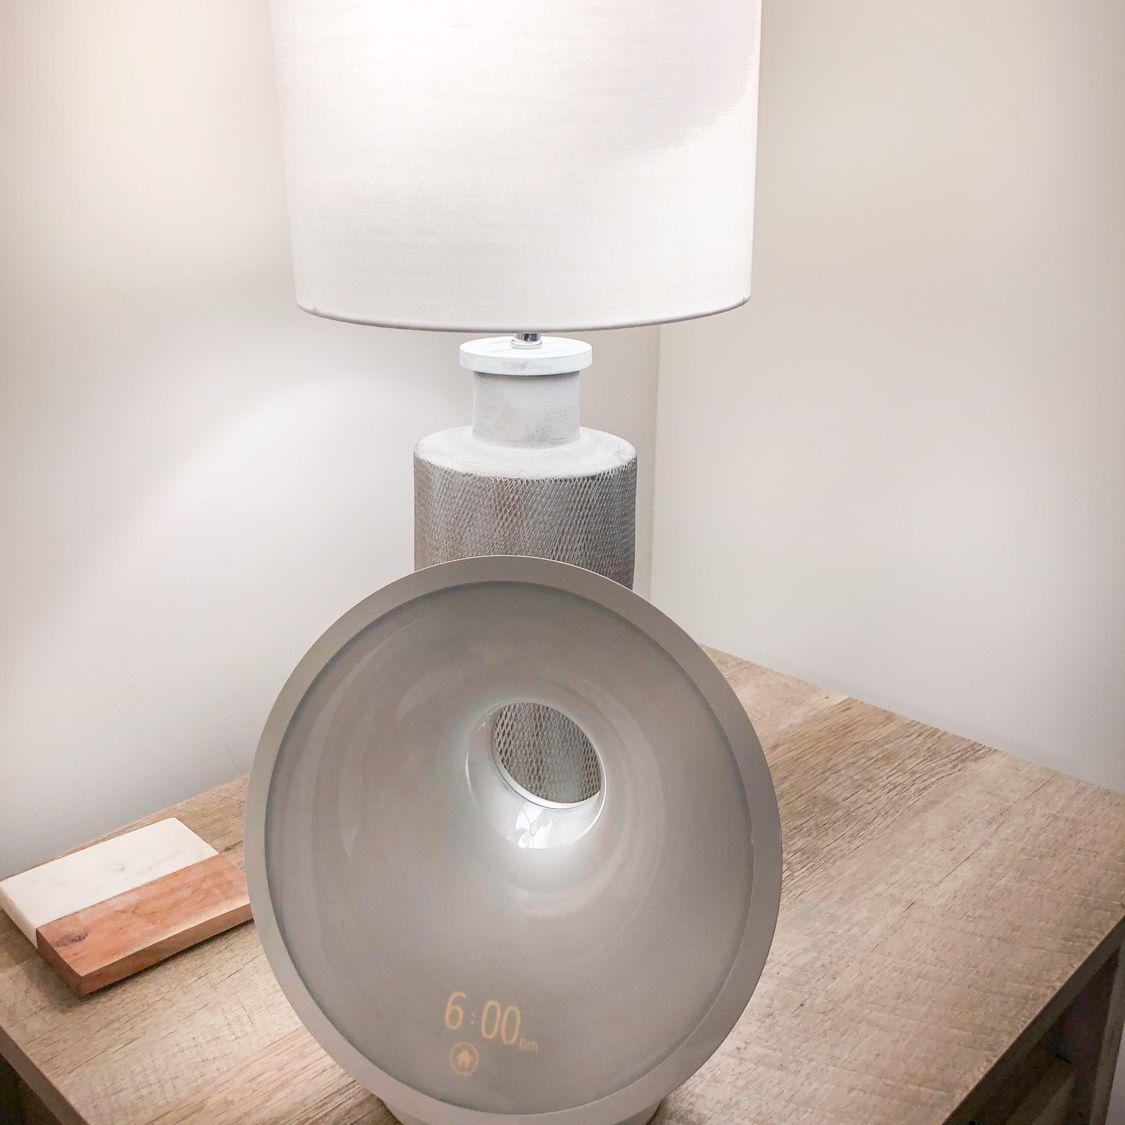 Philips Somneo HF3650/60 Sleep and Wake-Up Light Therapy Lamp